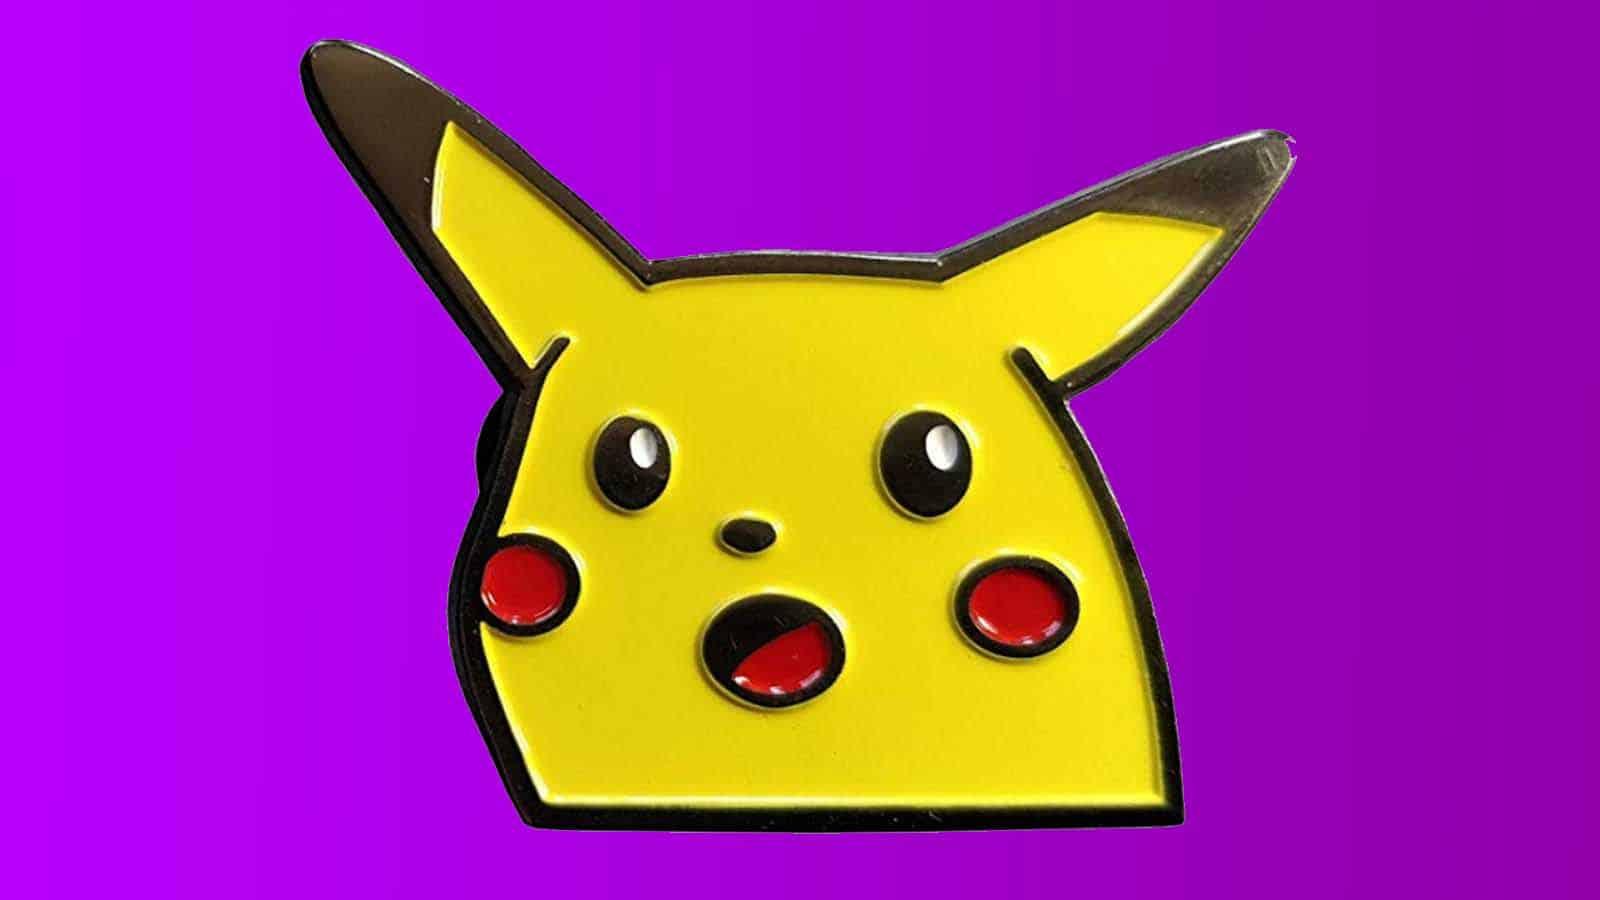 surprised pikachu face meme pendant